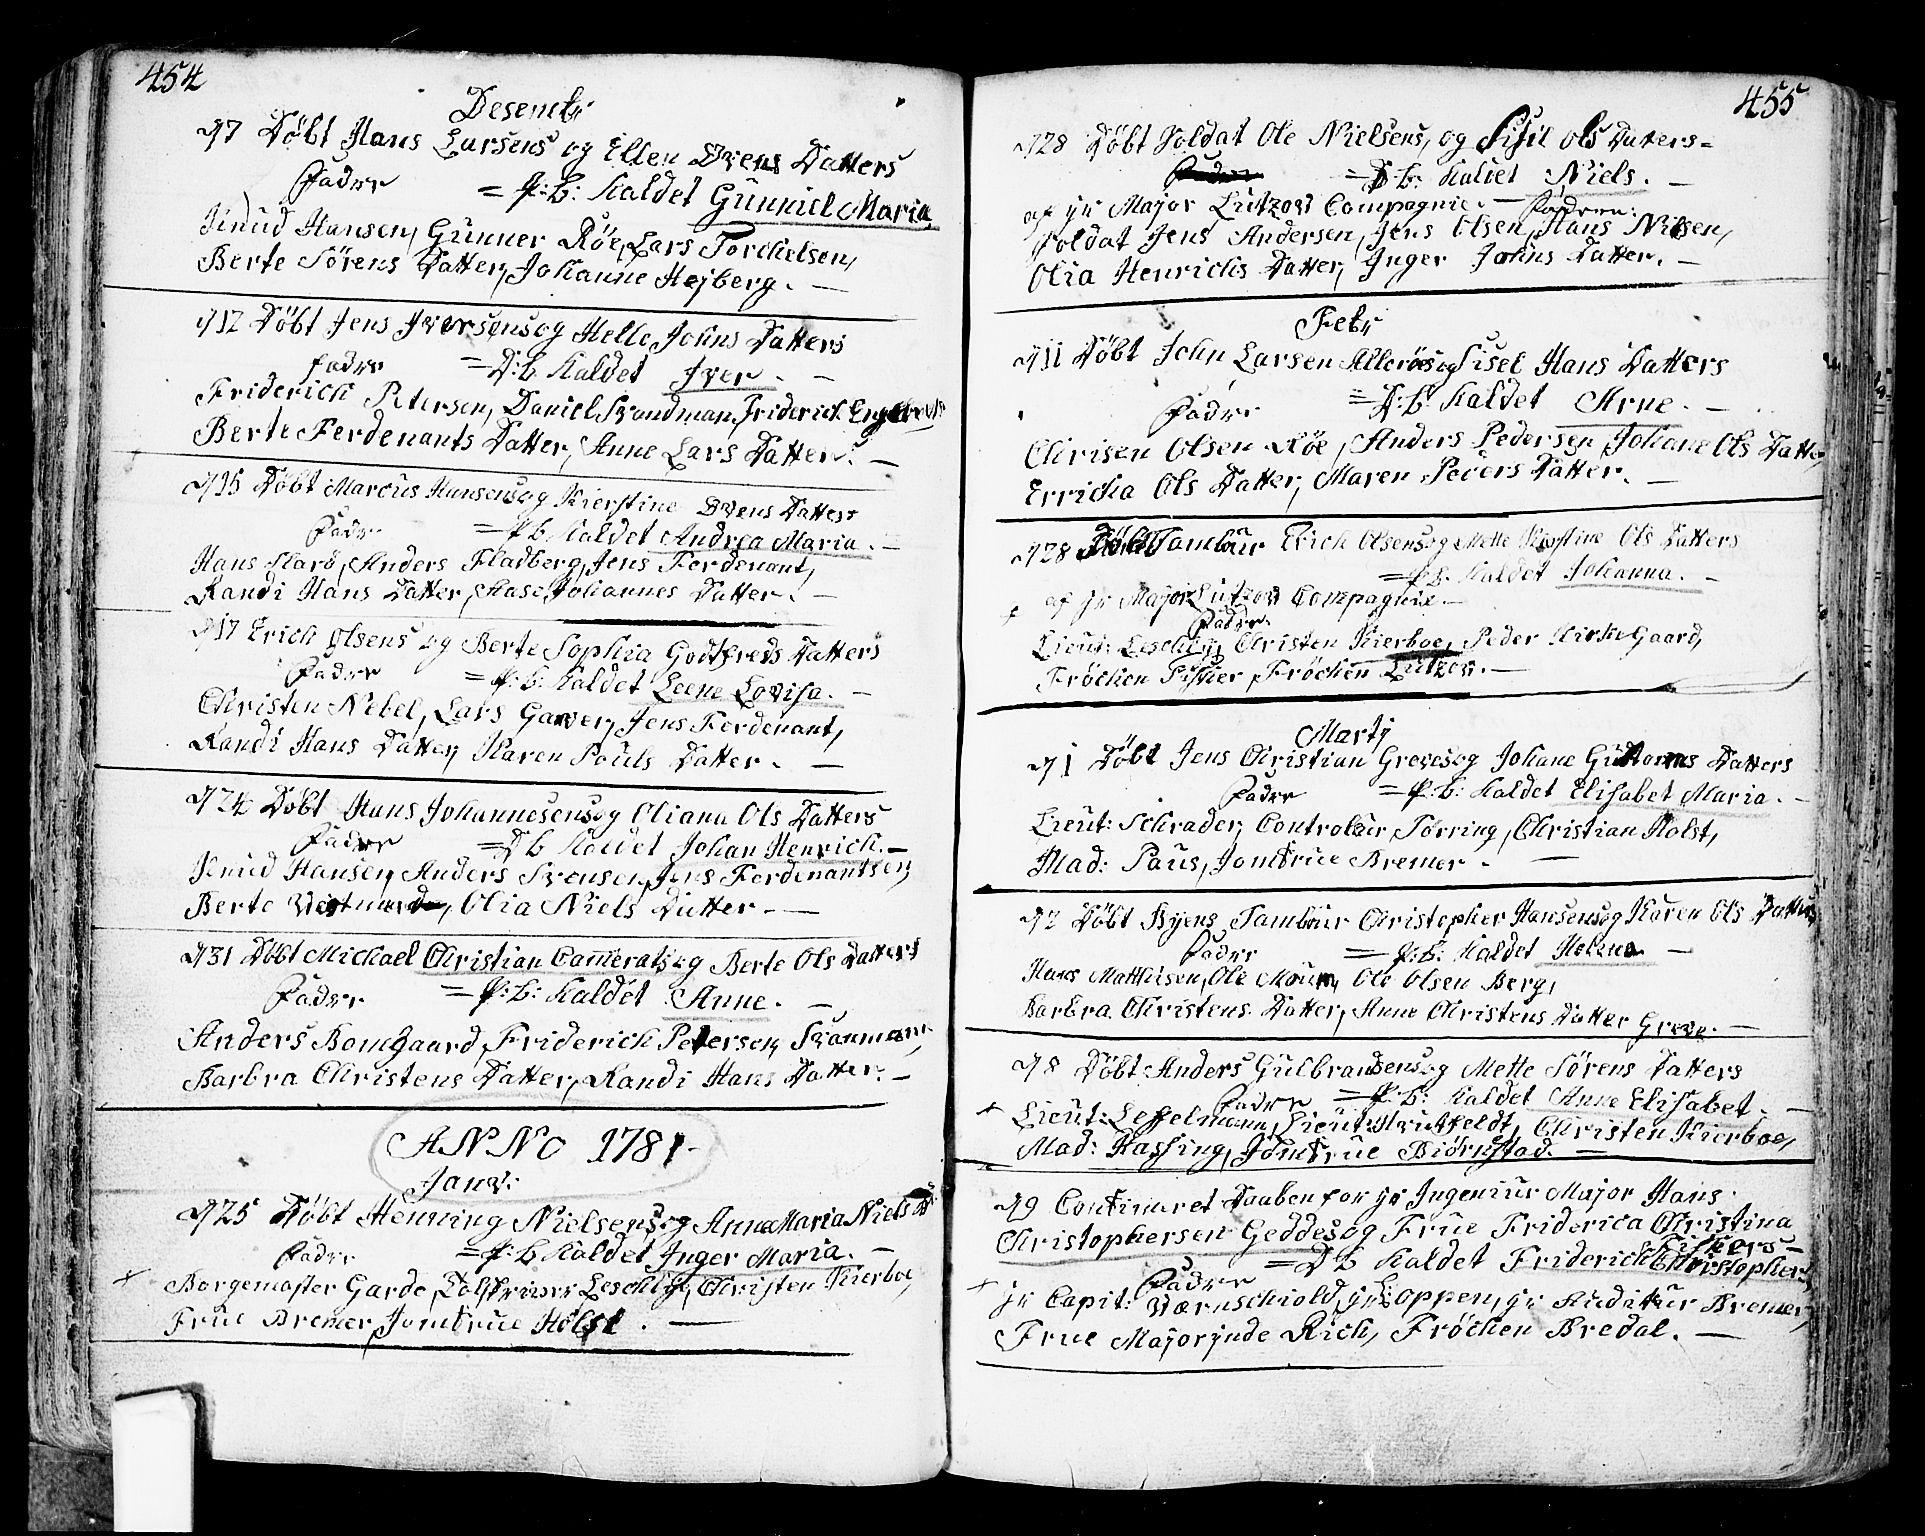 SAO, Fredrikstad prestekontor Kirkebøker, F/Fa/L0002: Ministerialbok nr. 2, 1750-1804, s. 454-455